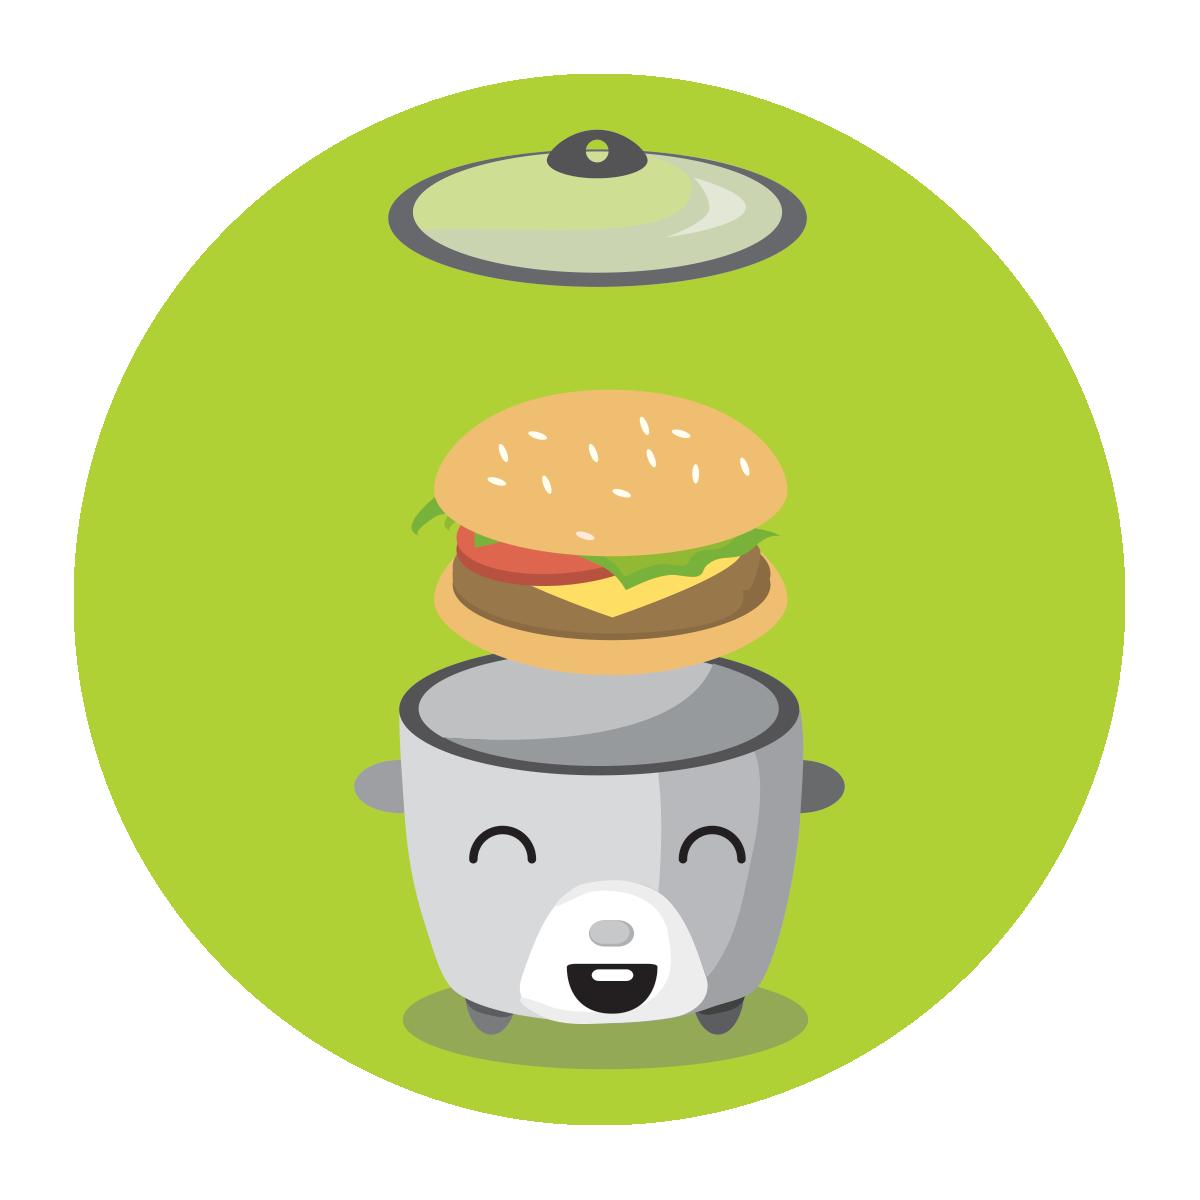 ricecooker_burger